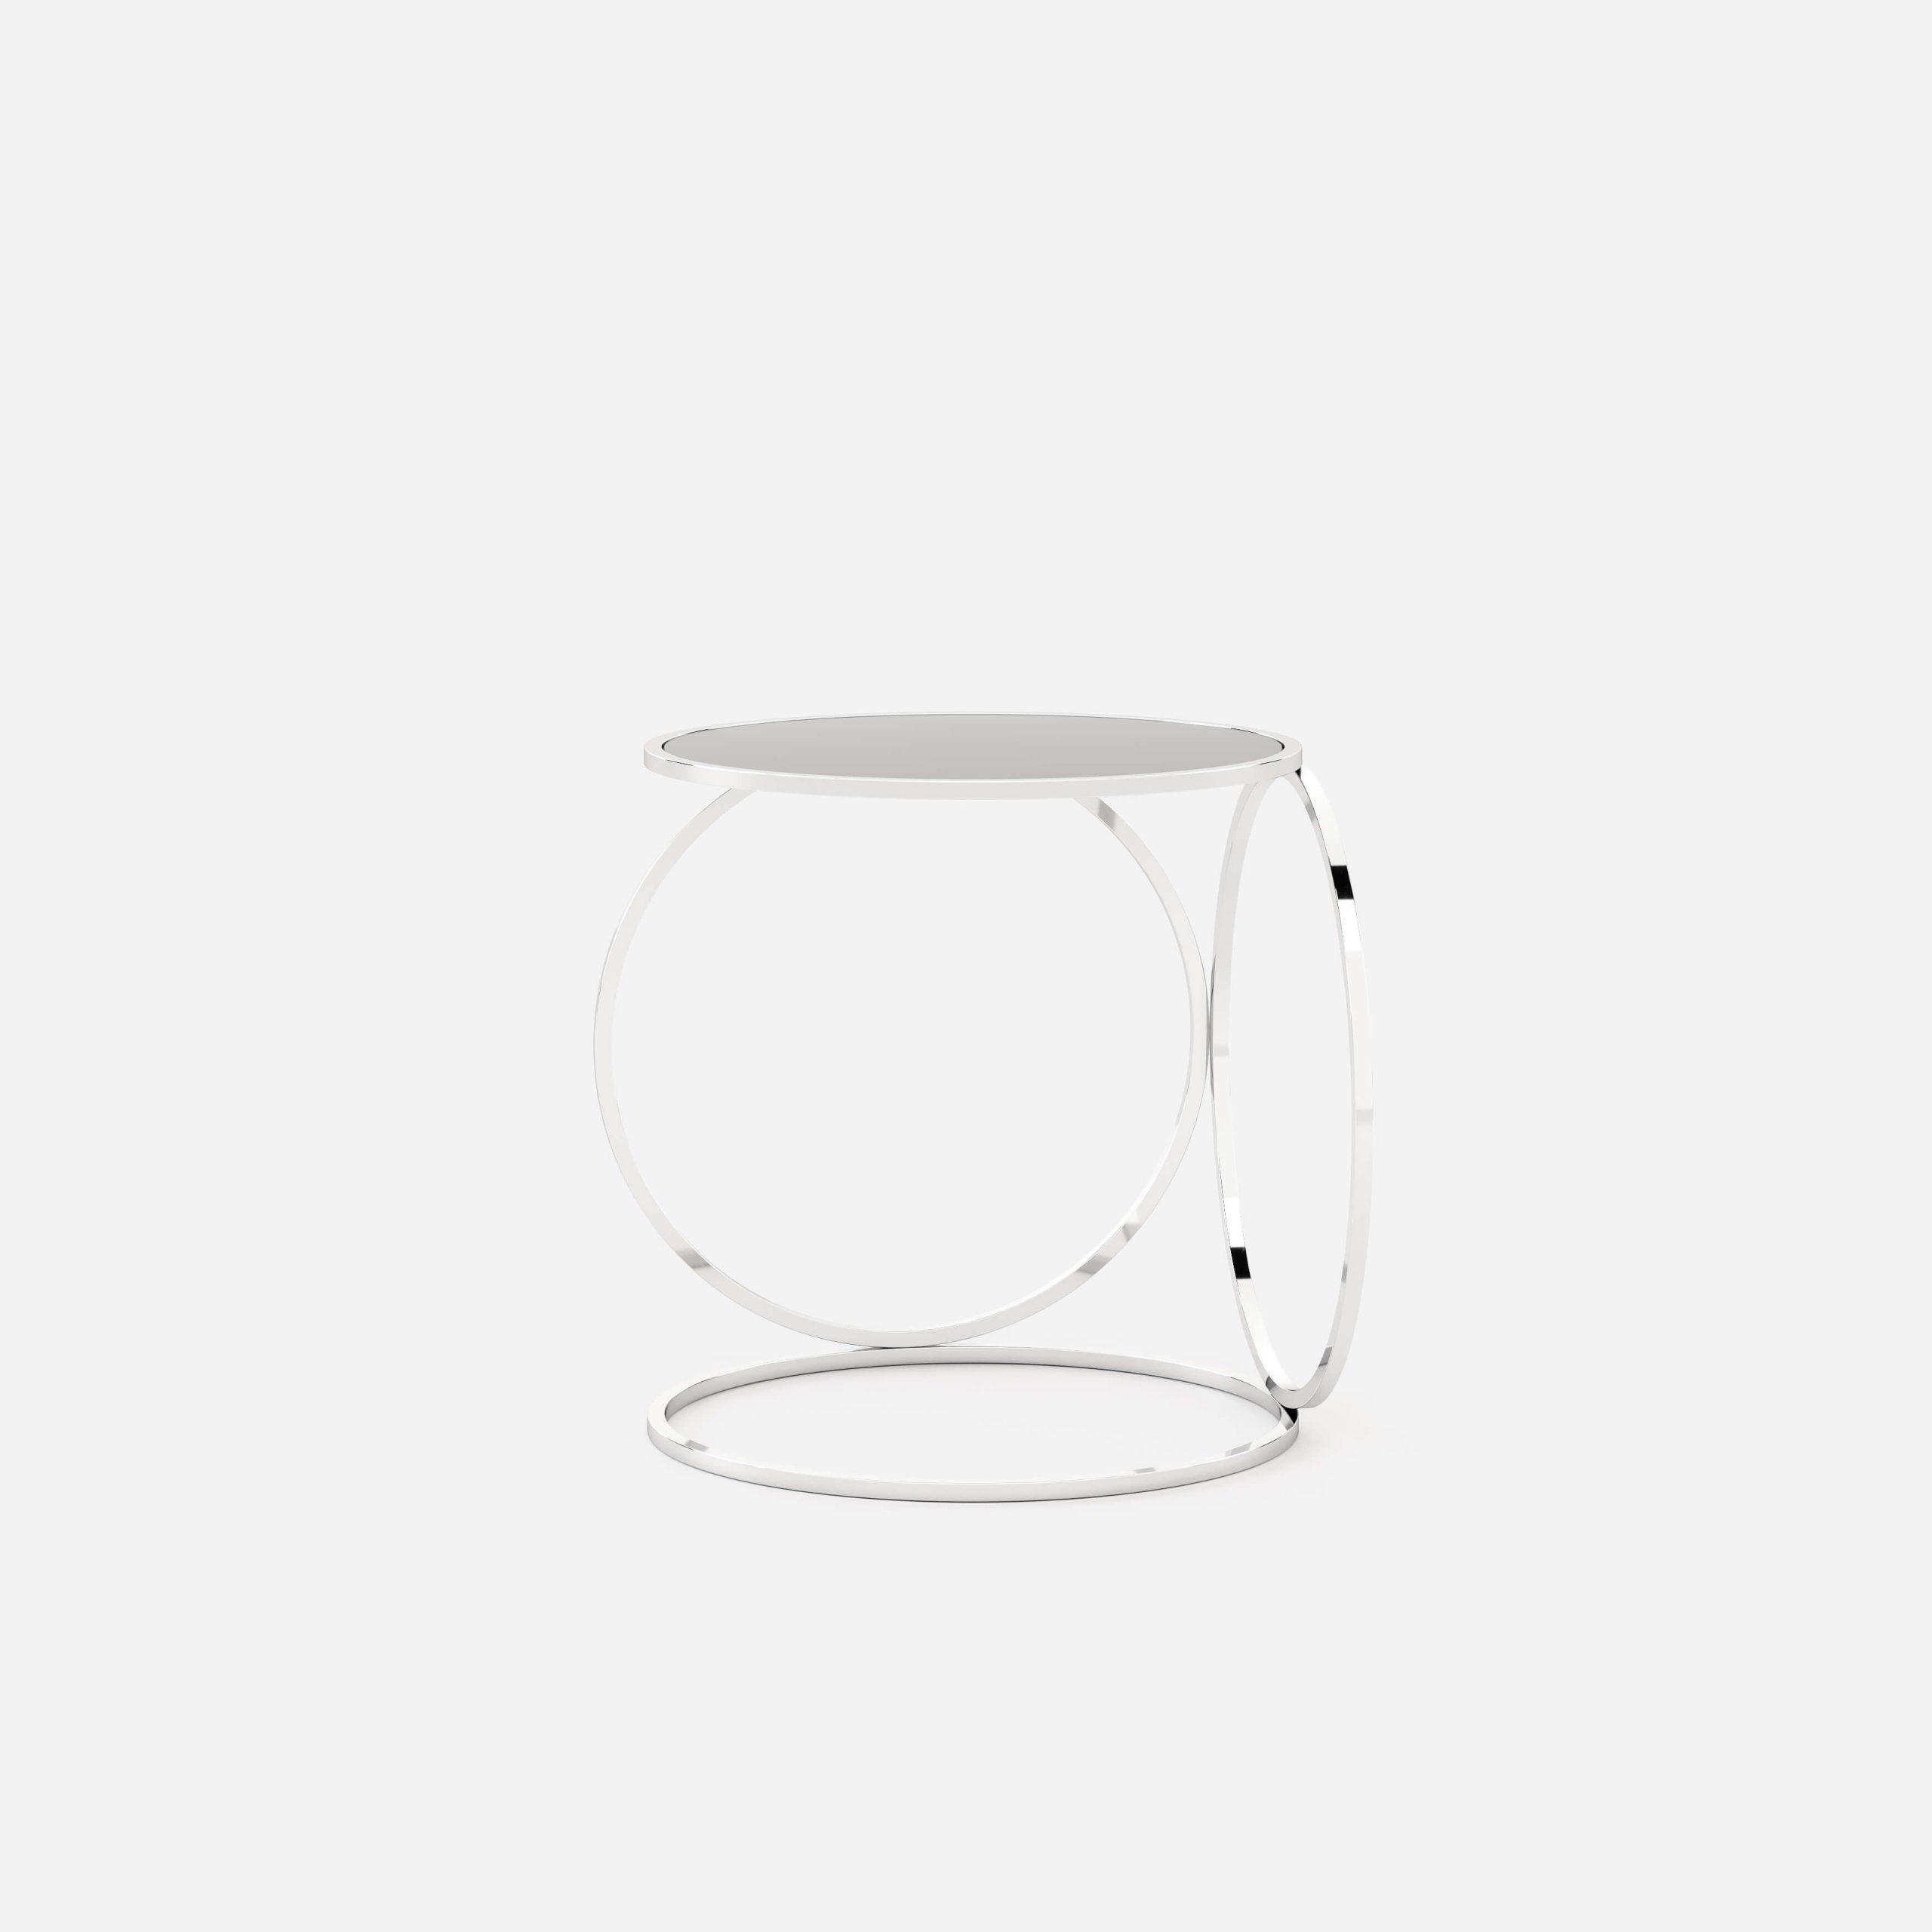 sharon-side-table-room-contemporary-design-domkapa-1